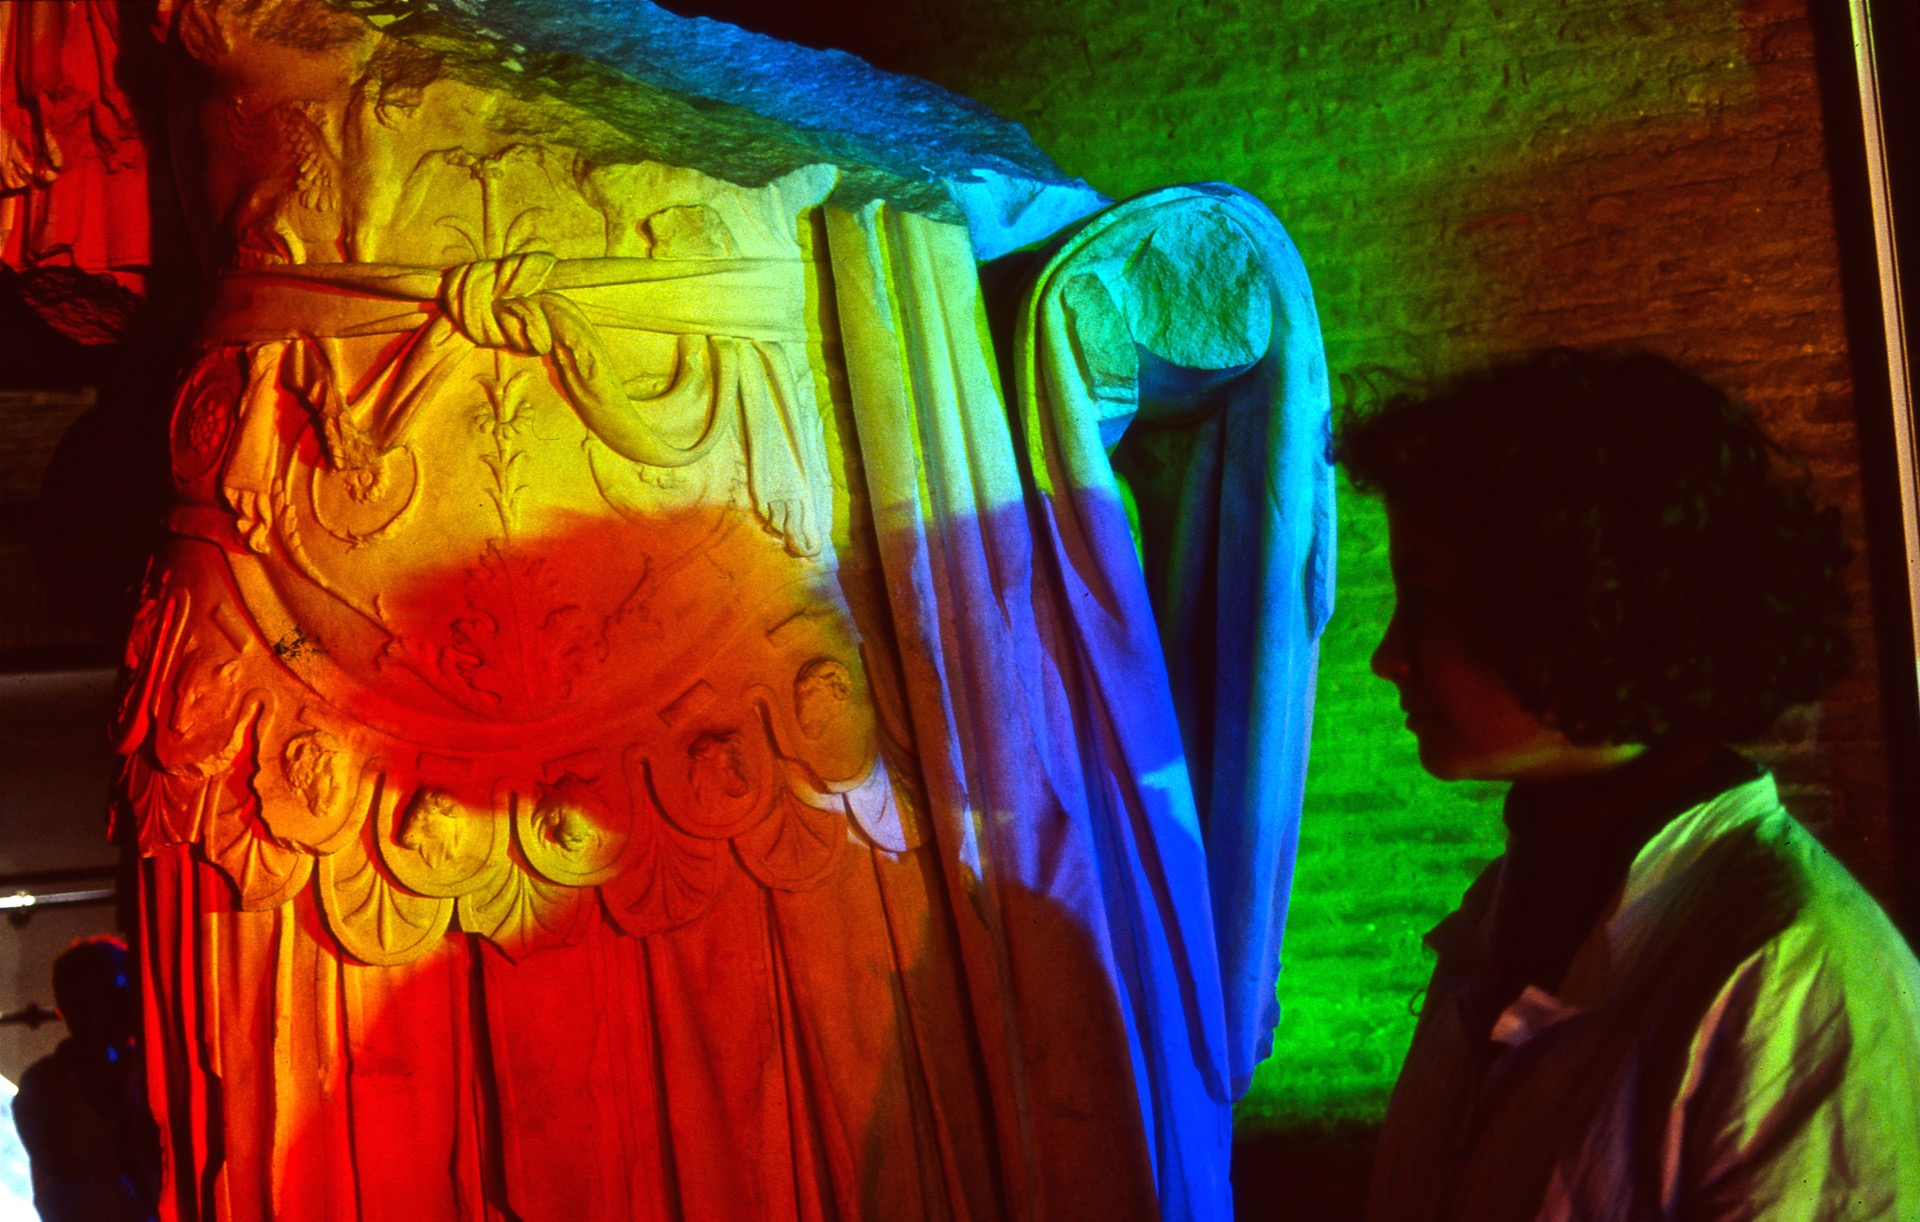 woman creates multiple colored solar spectrum shadows on an ancient Roman marble sculpture